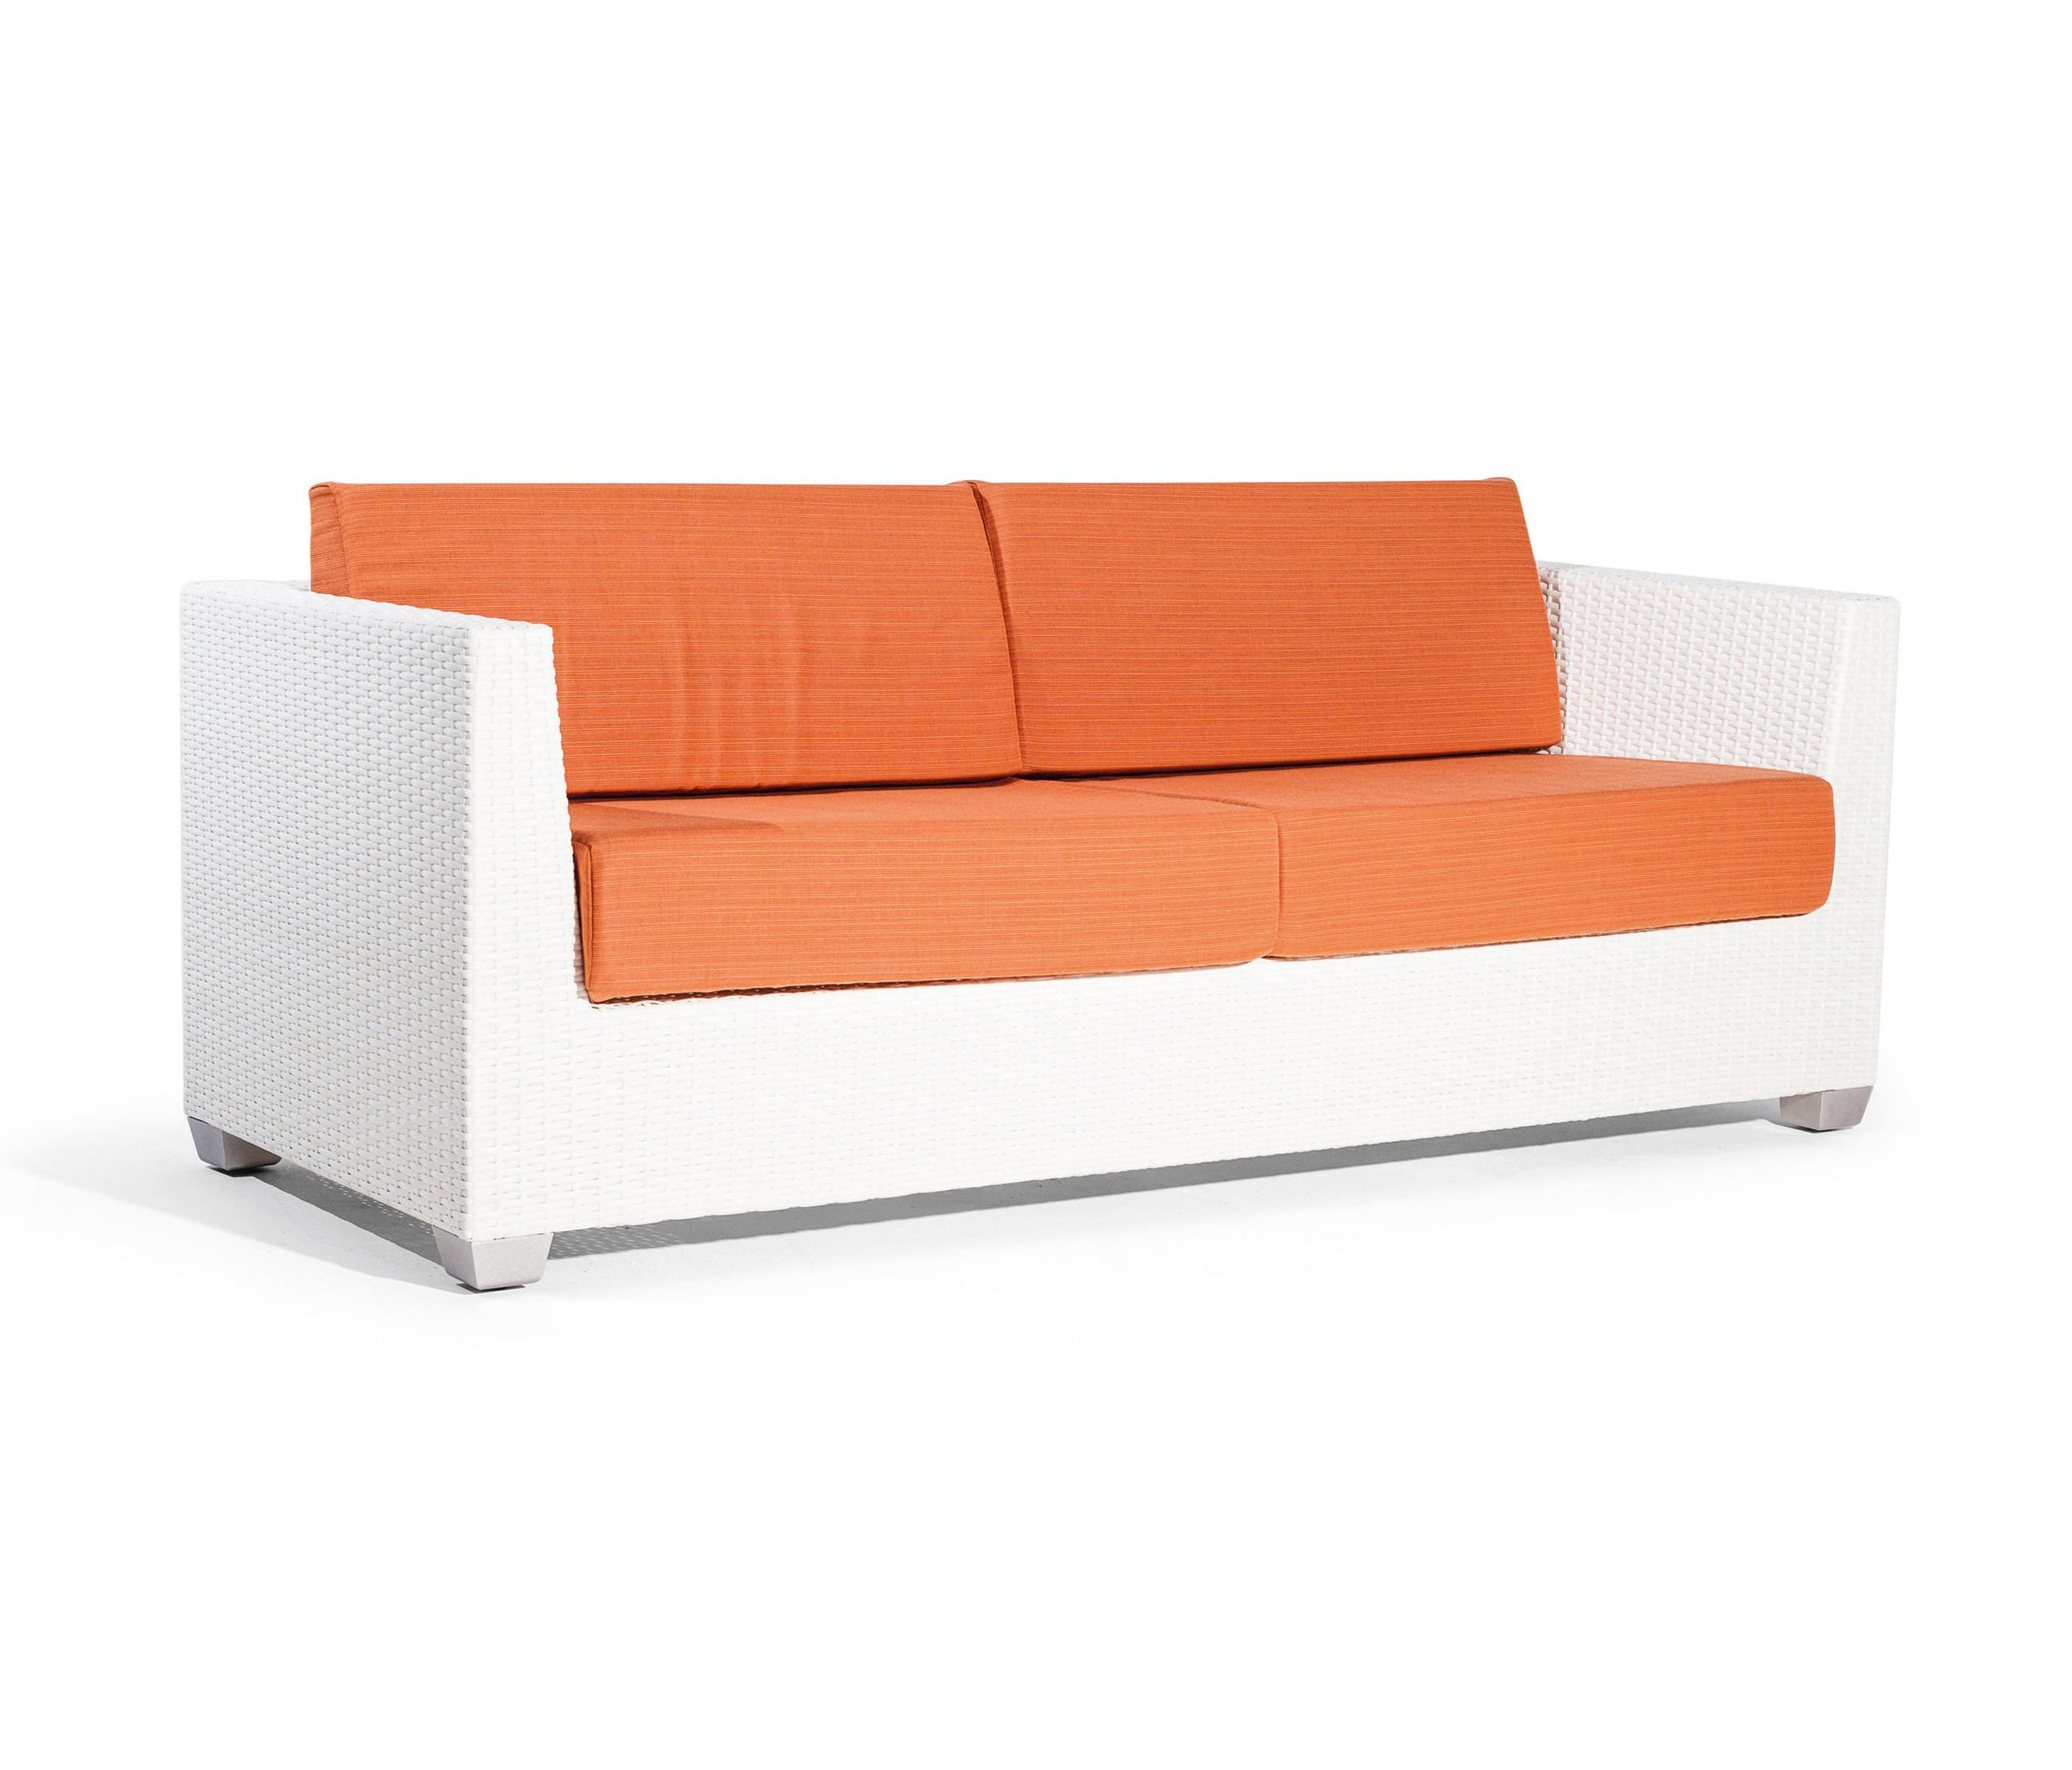 Giada sofa 3p sofas de jardin de varaschin architonic for Jardin 3p